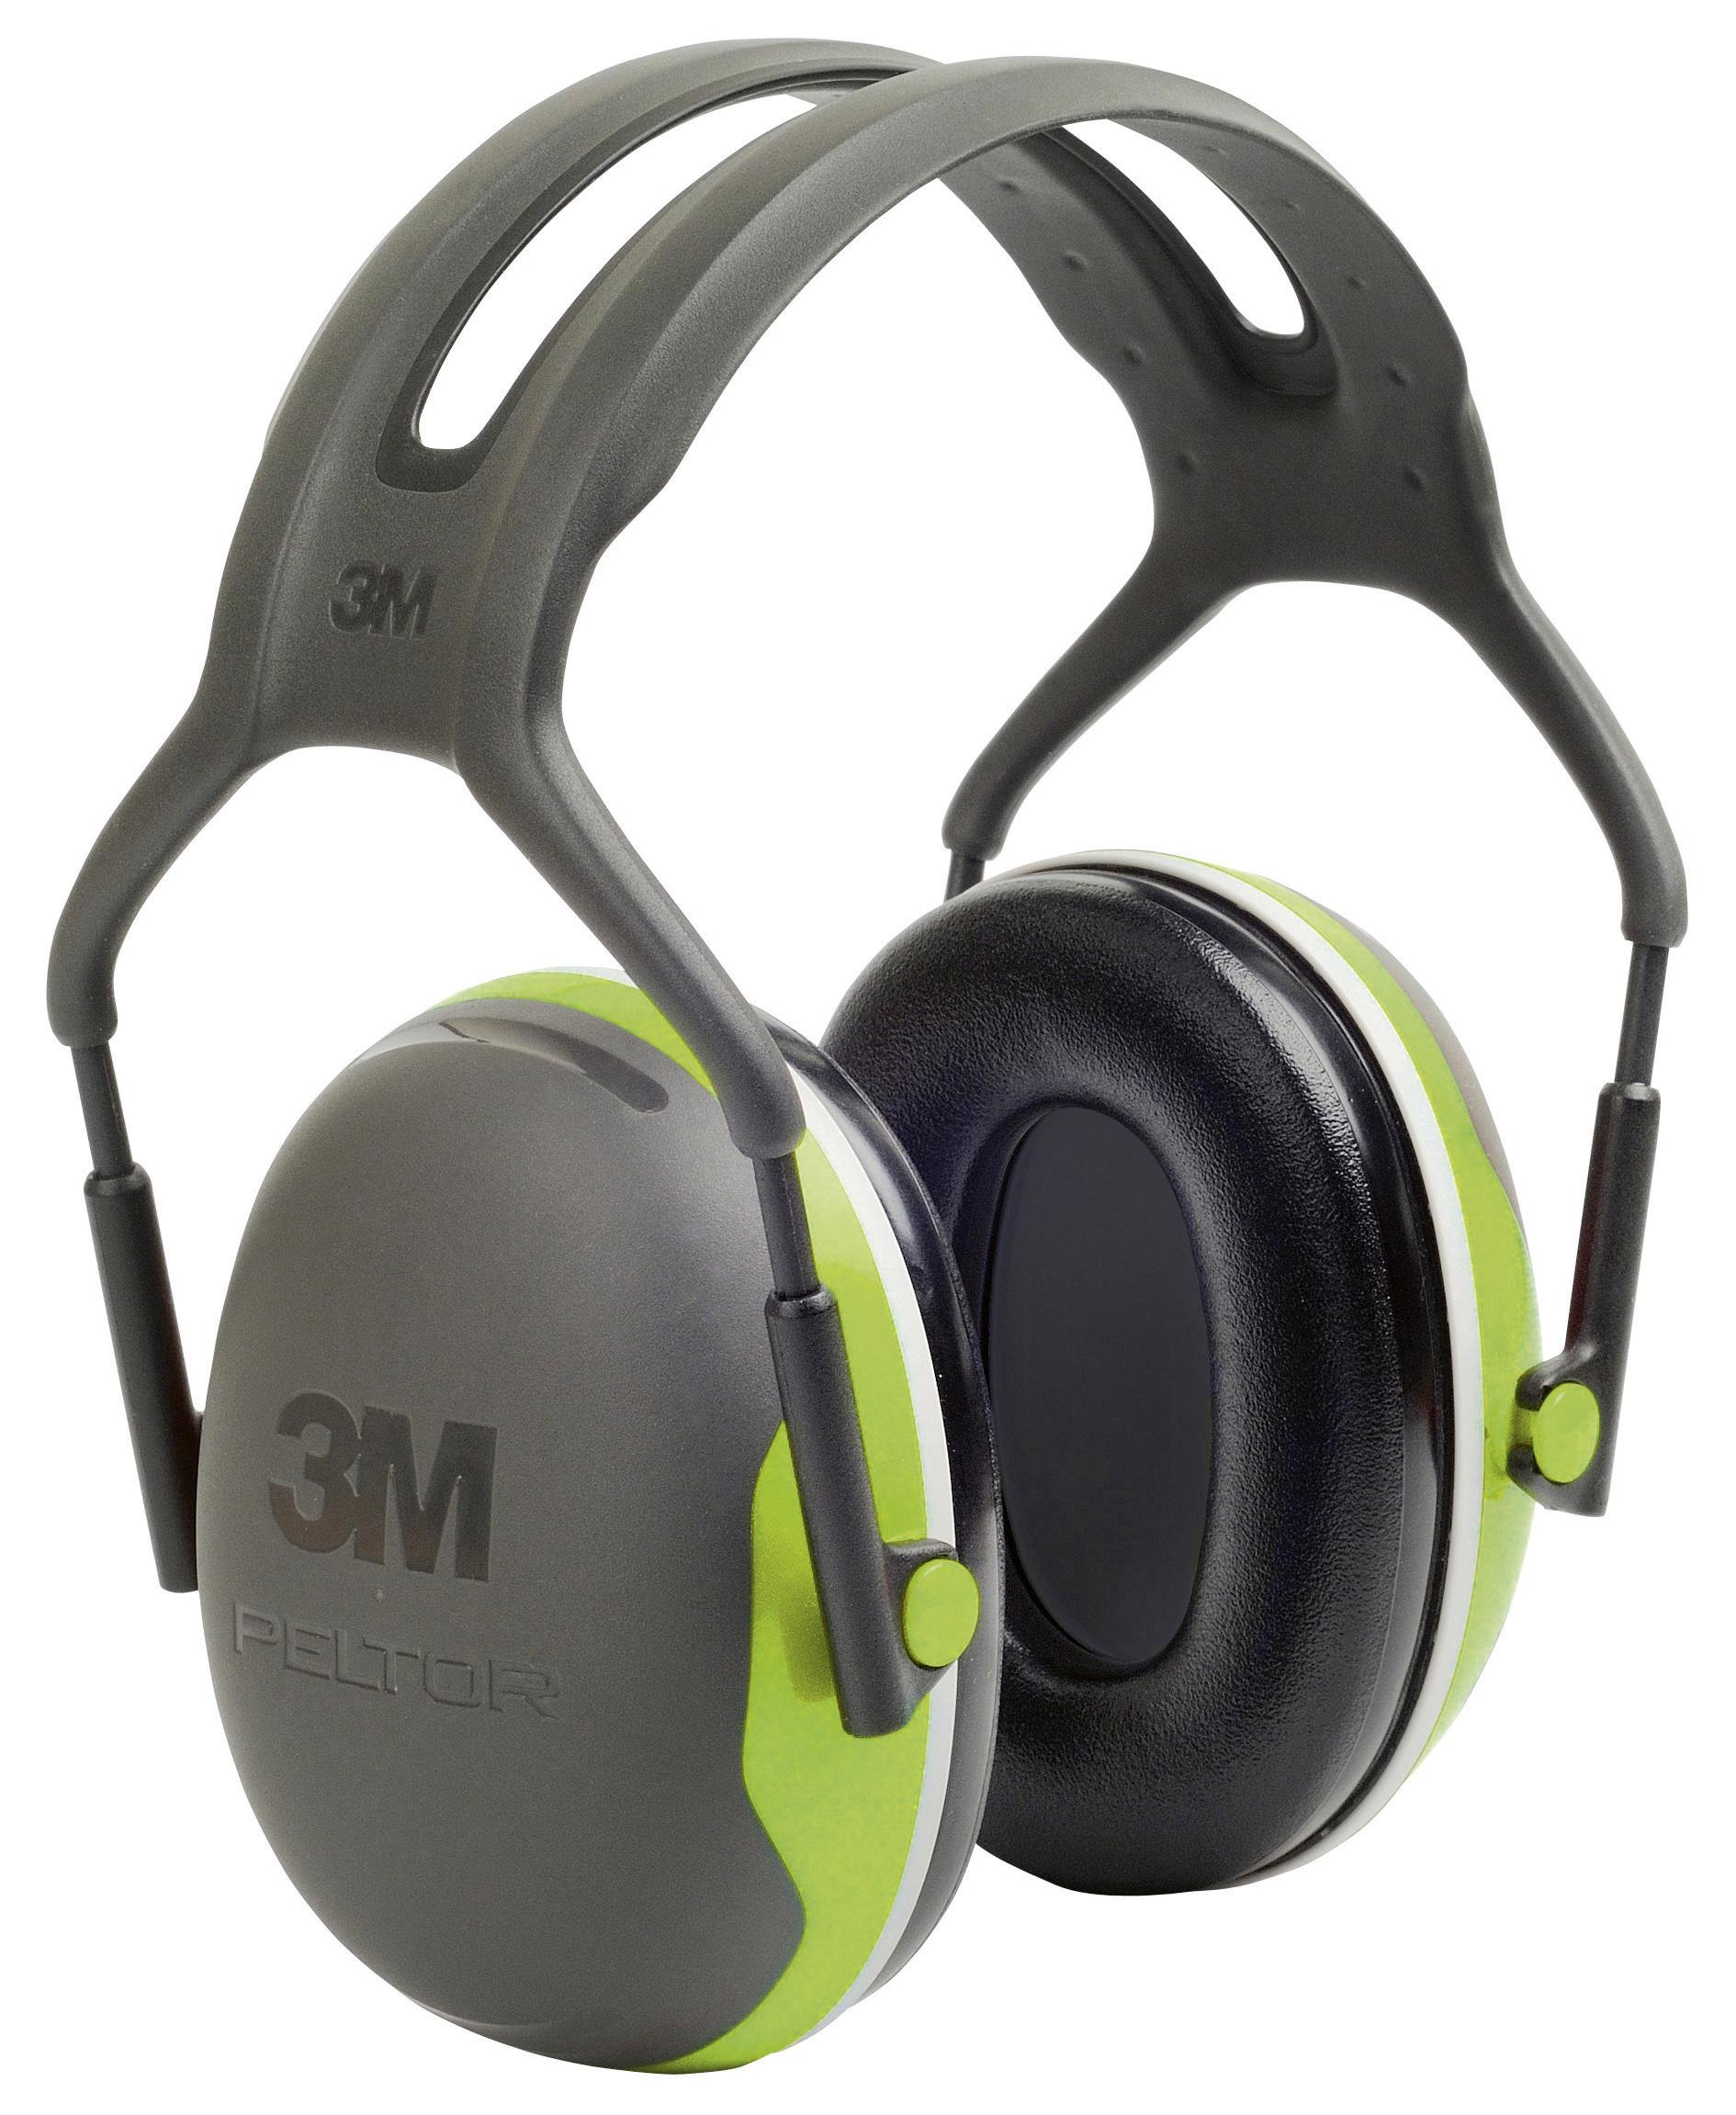 Gehörschutz Peltor X4A (SNR=35dB)